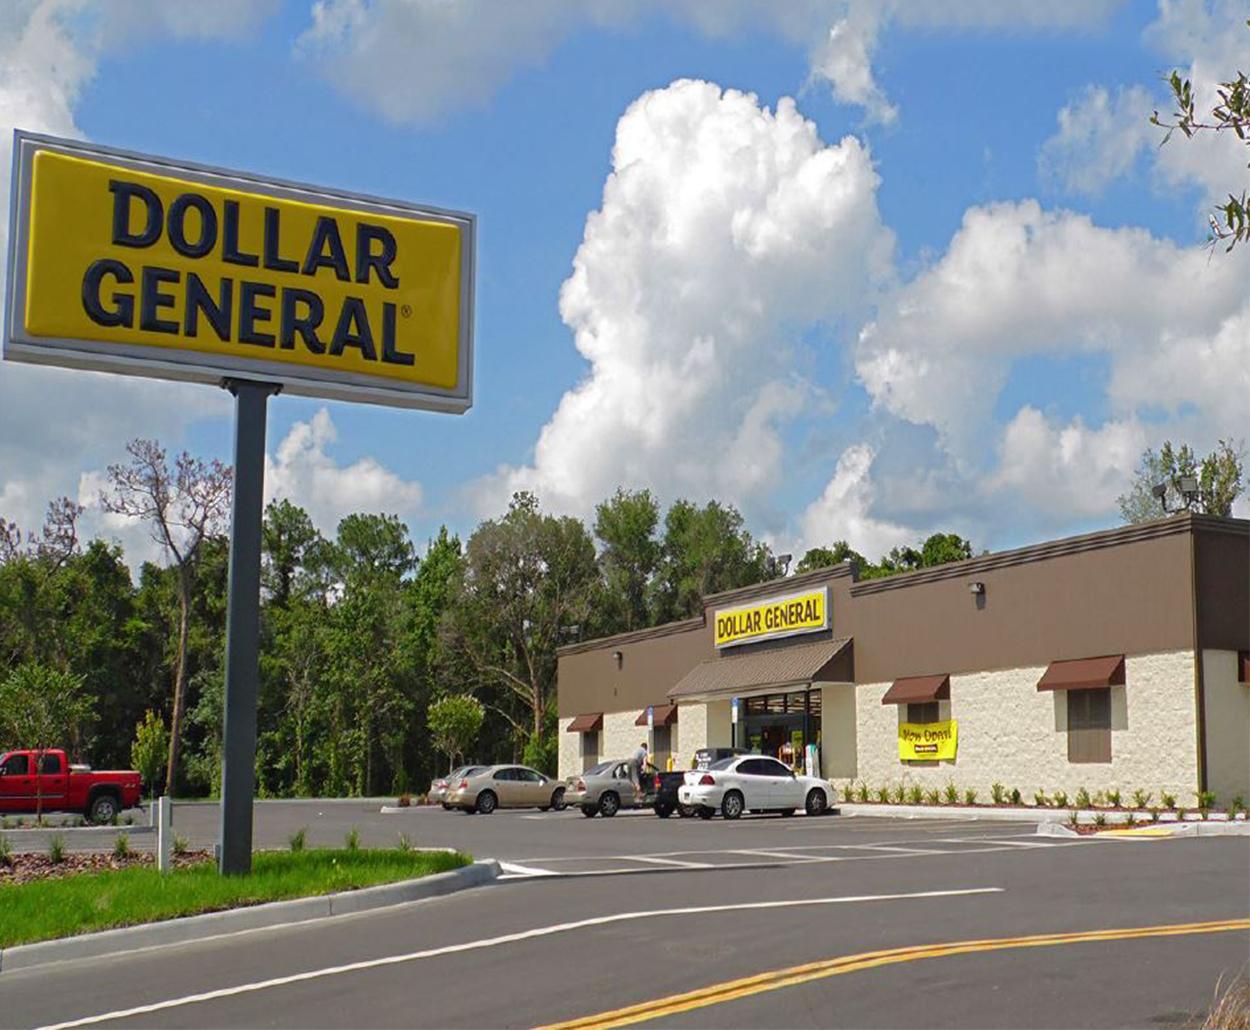 Dollar General | Buyers's testimonial